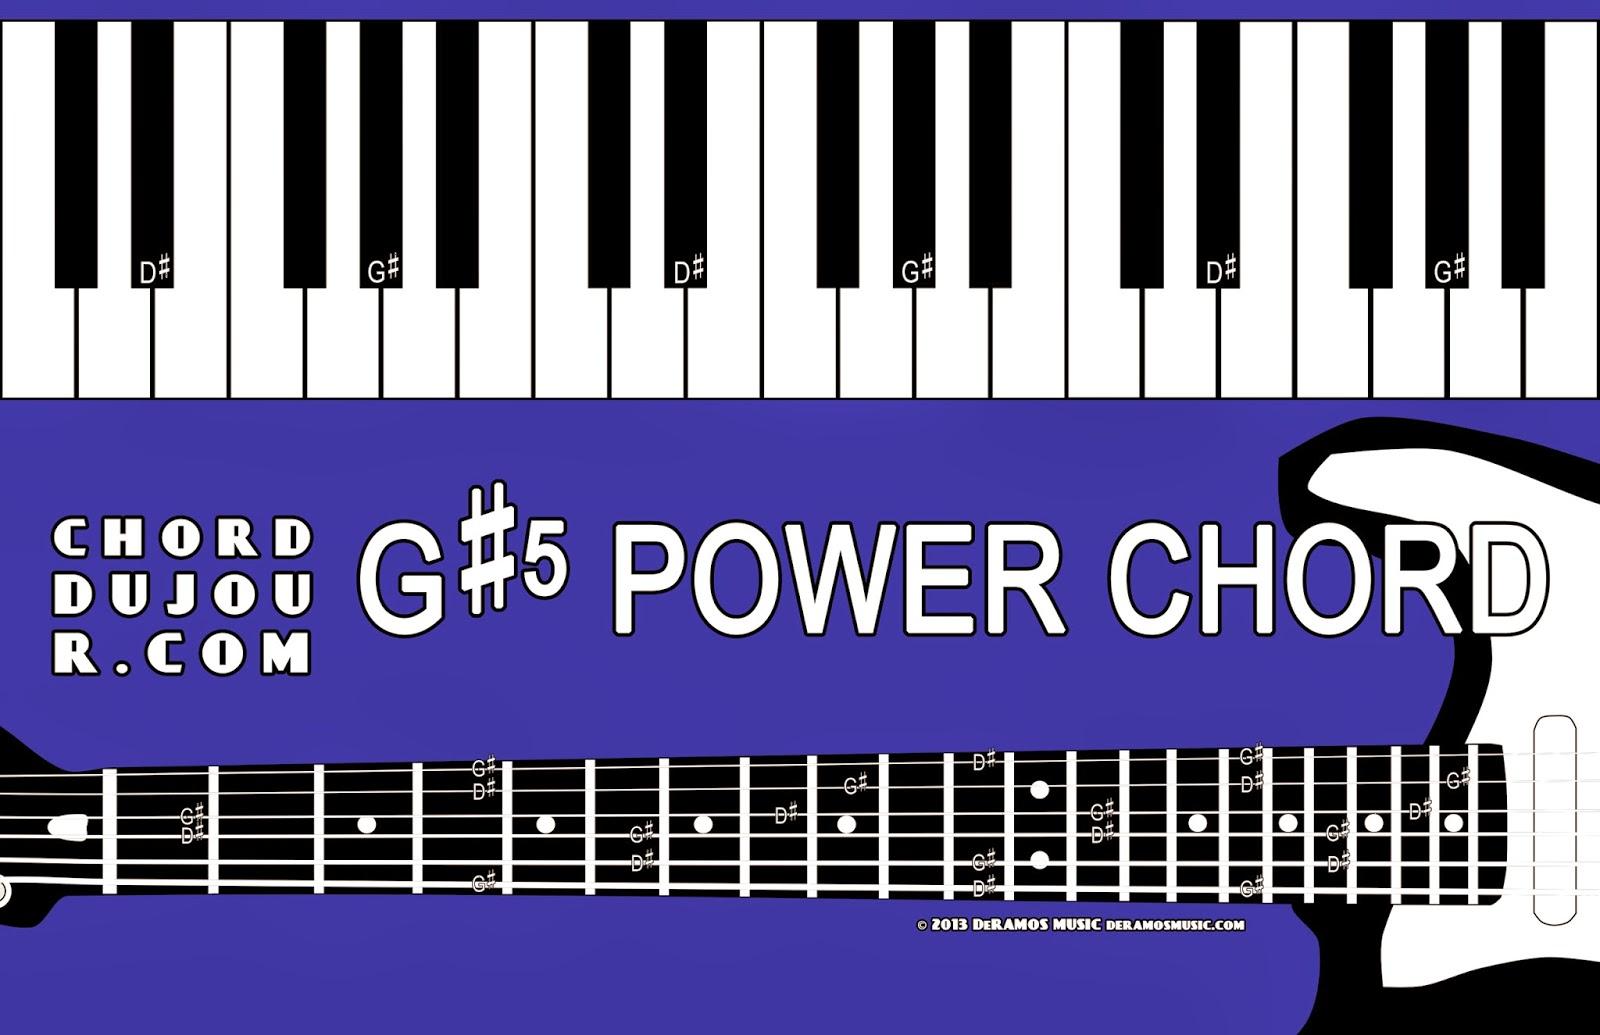 Chord du jour october 2013 dictionary g5 power chord hexwebz Choice Image